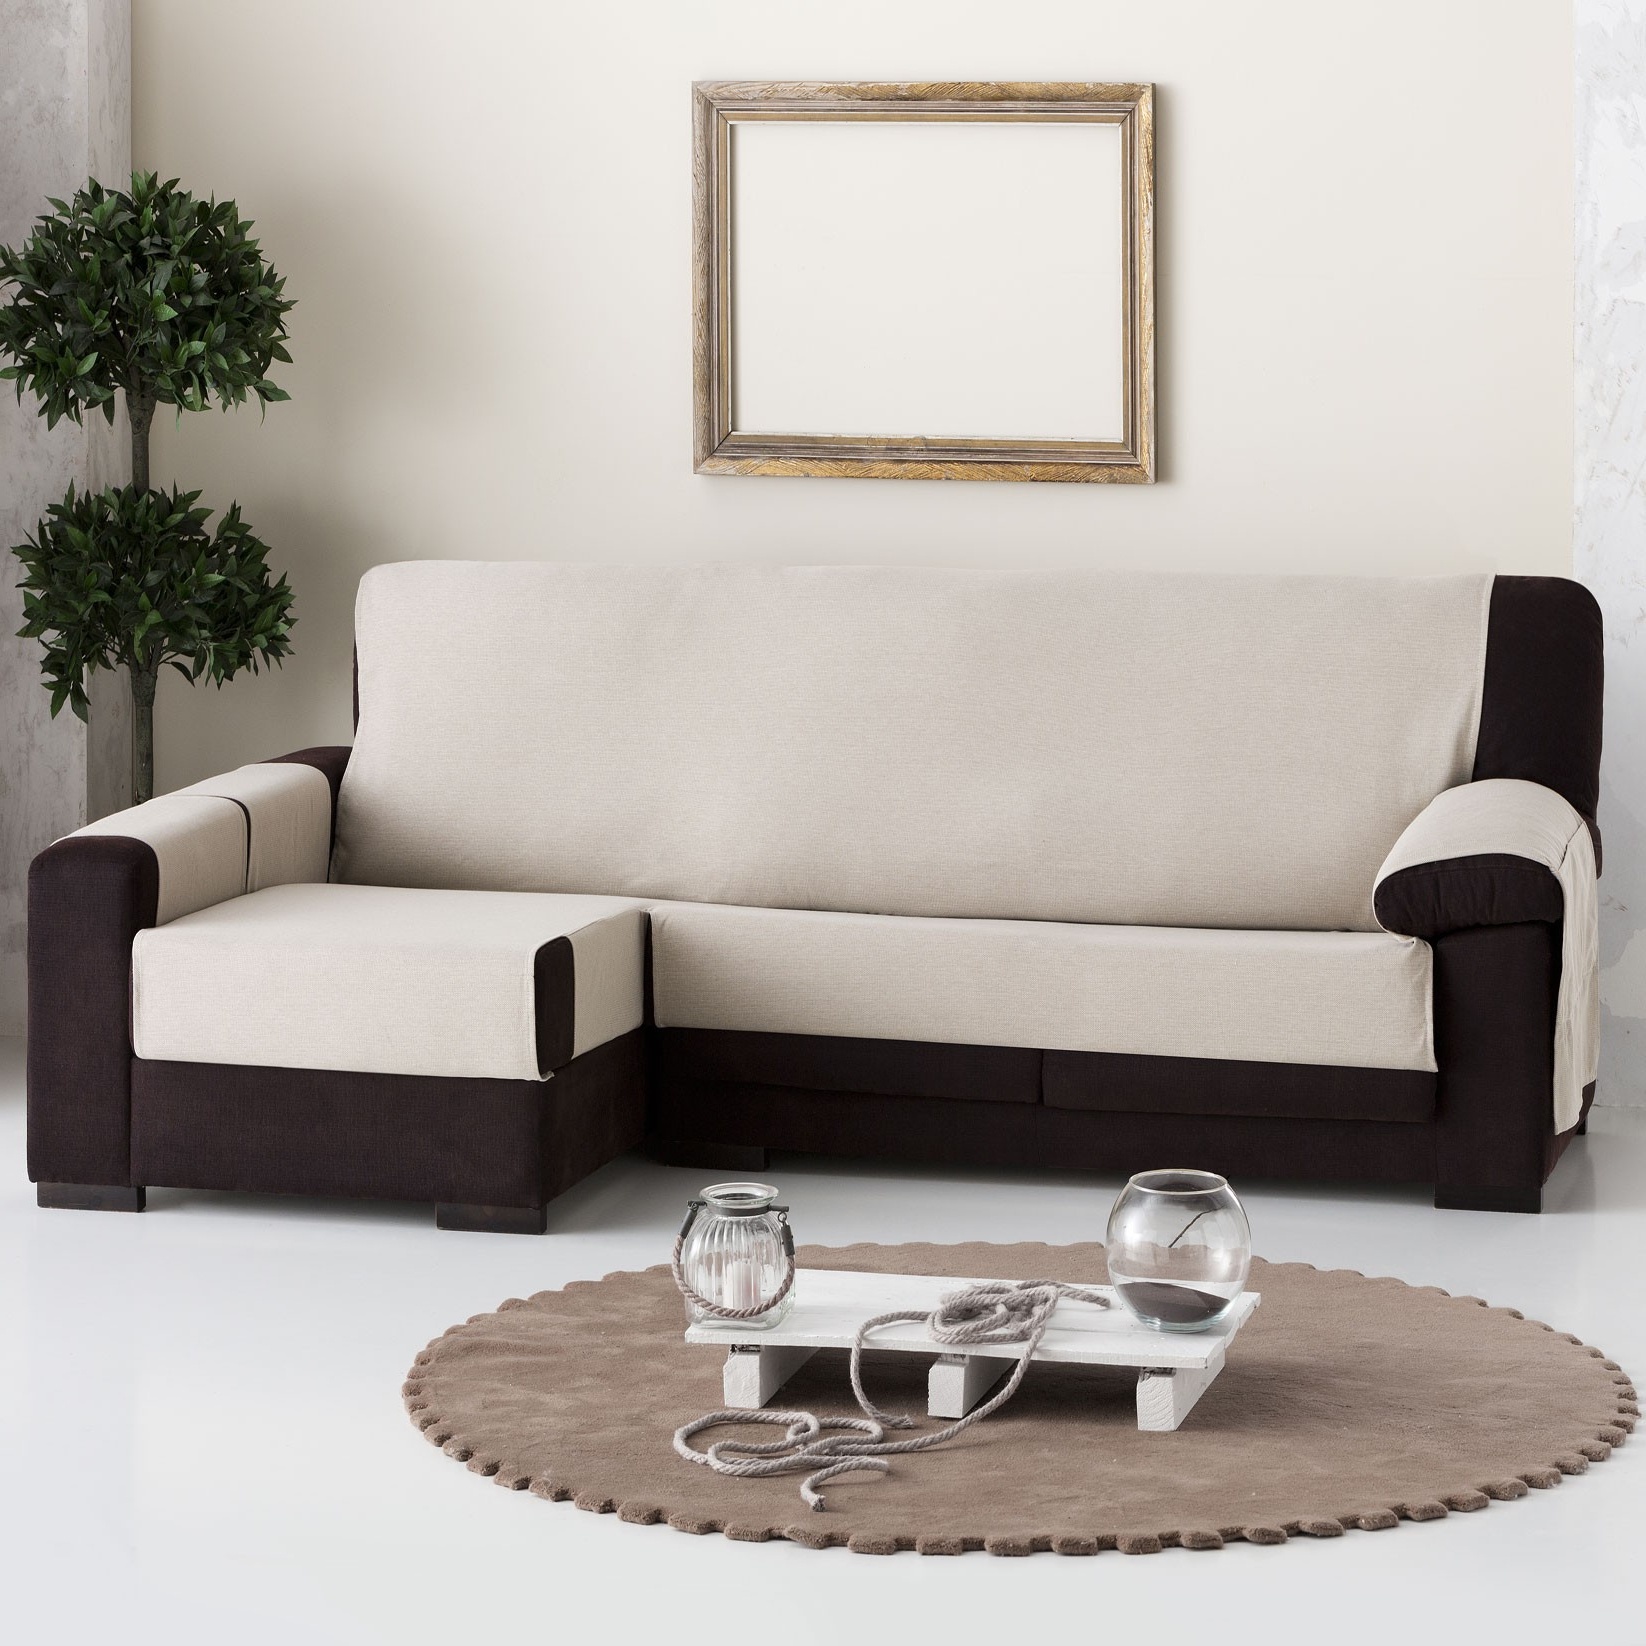 Funda sofa Chaise Longue 3id6 Funda sofà Chaise Longue Prà Ctica Constanza Lino